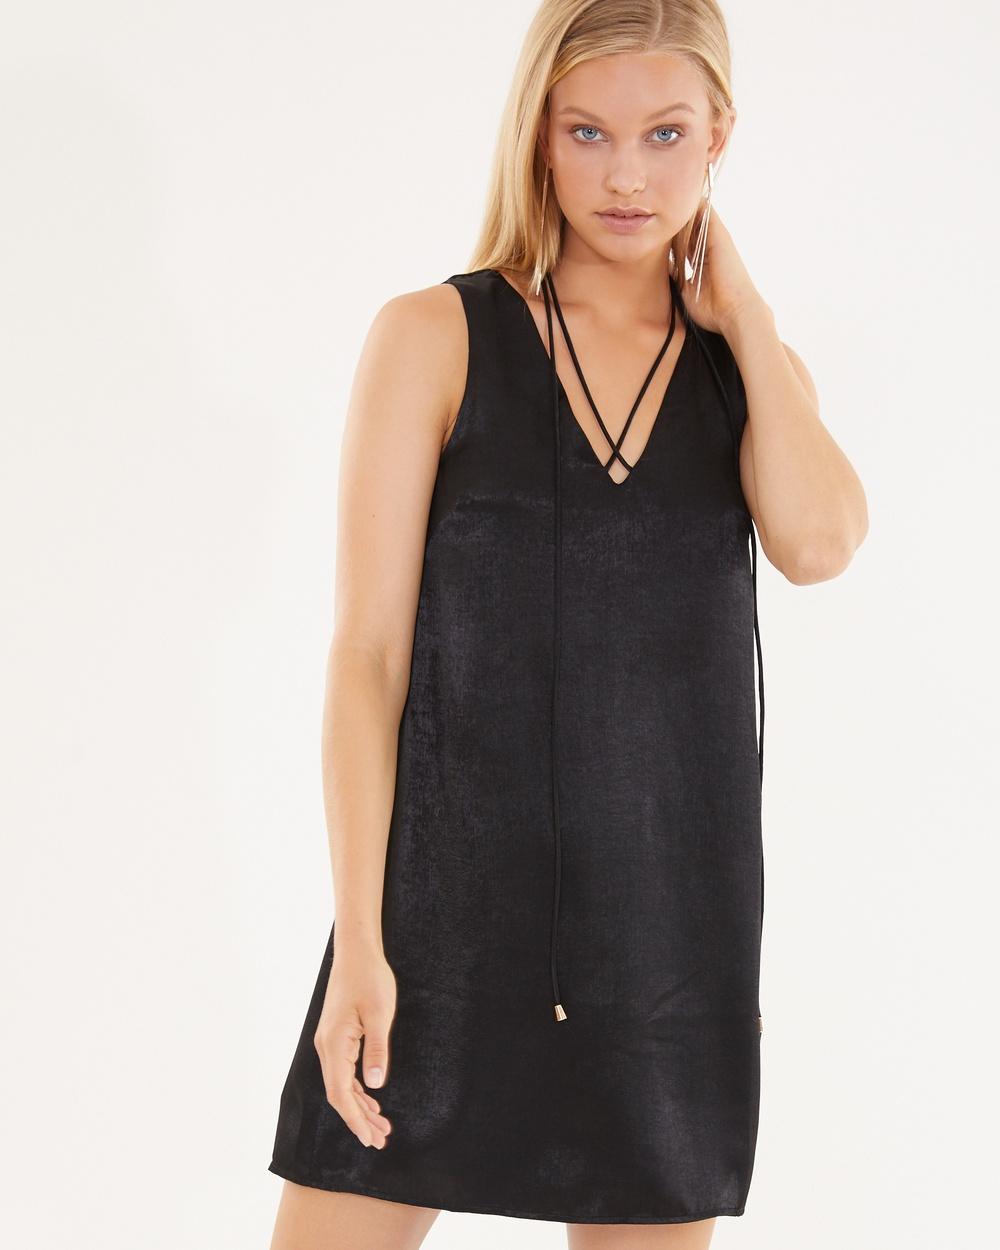 Photo of Tussah Black Kaiti Shift Dress - buy Tussah dresses on sale online